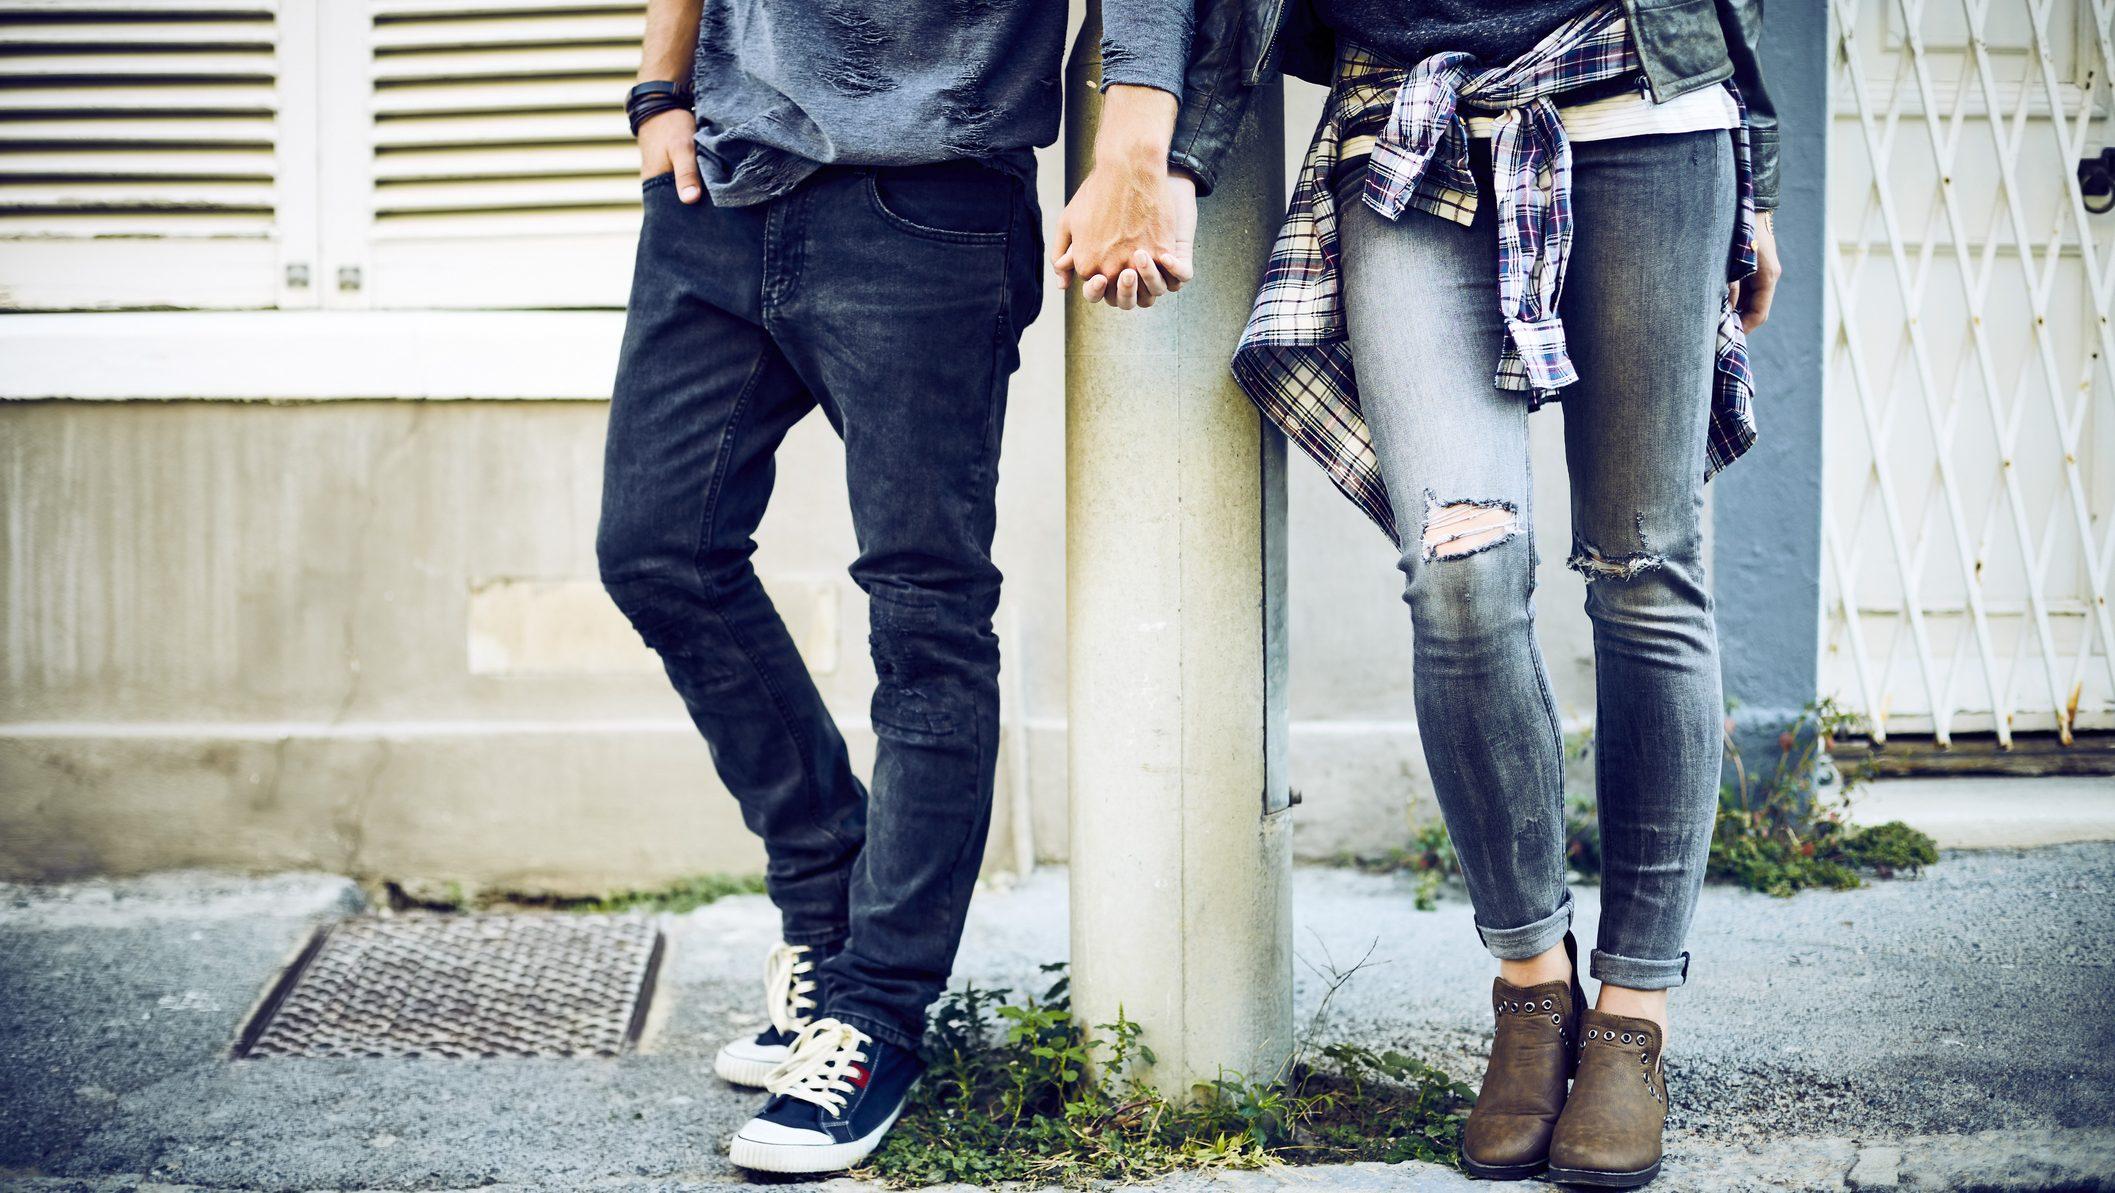 Whitecaps star promotes Jeans Day